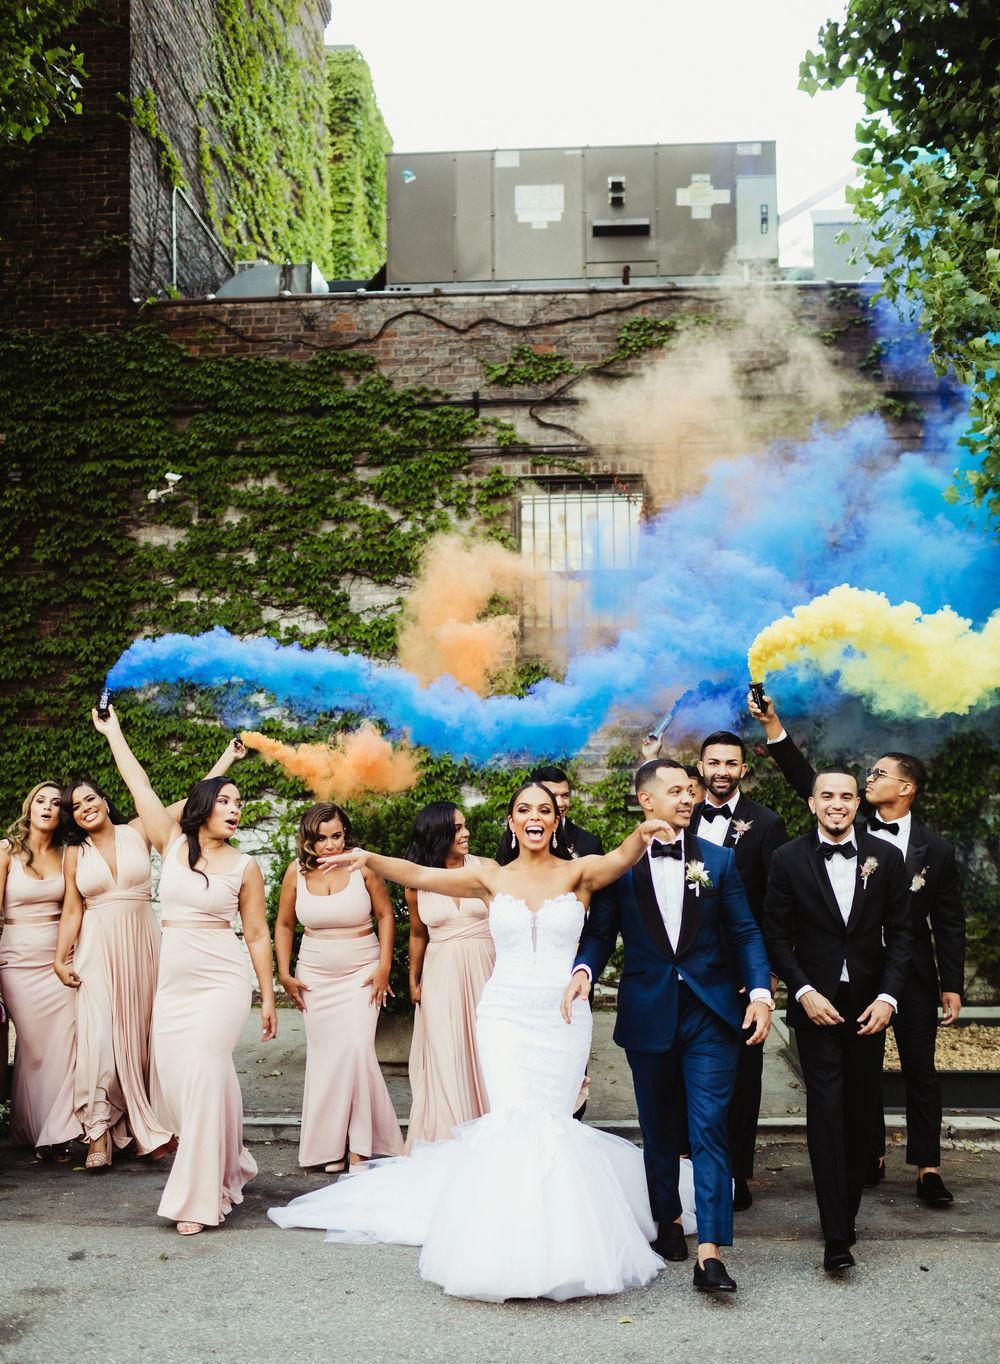 Elegant Weddings Luxury Destination Wedding Most Luxurious